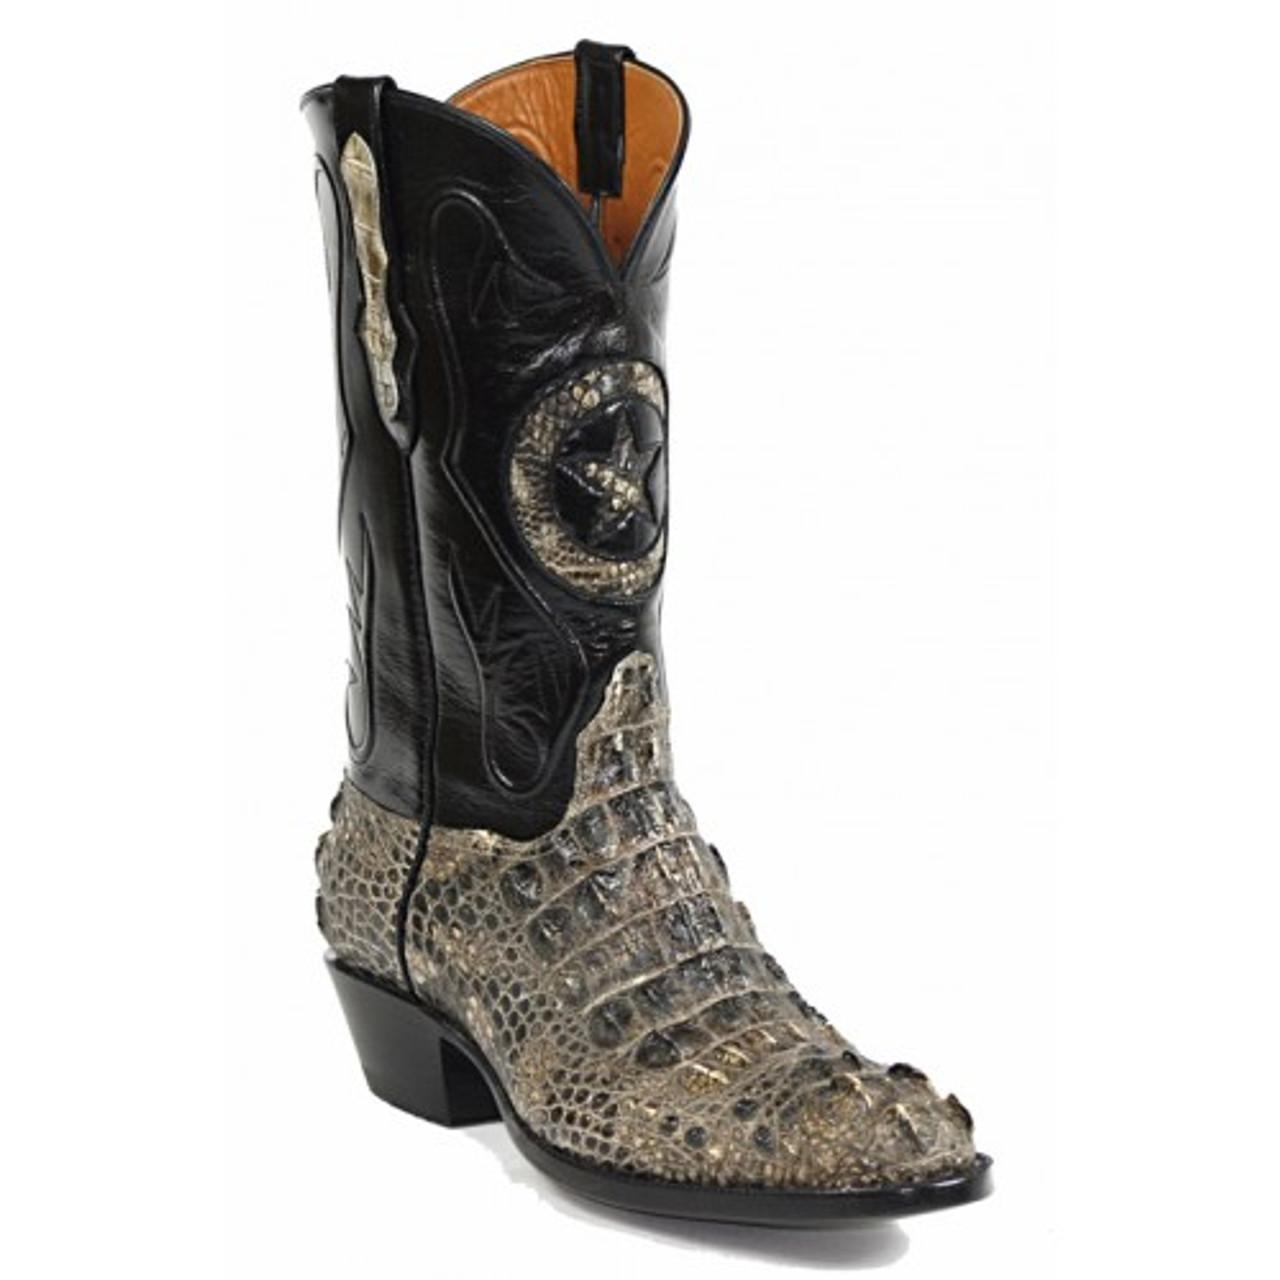 5e560aae520 Black Jack Boots - American Alligator Hornback #180-1